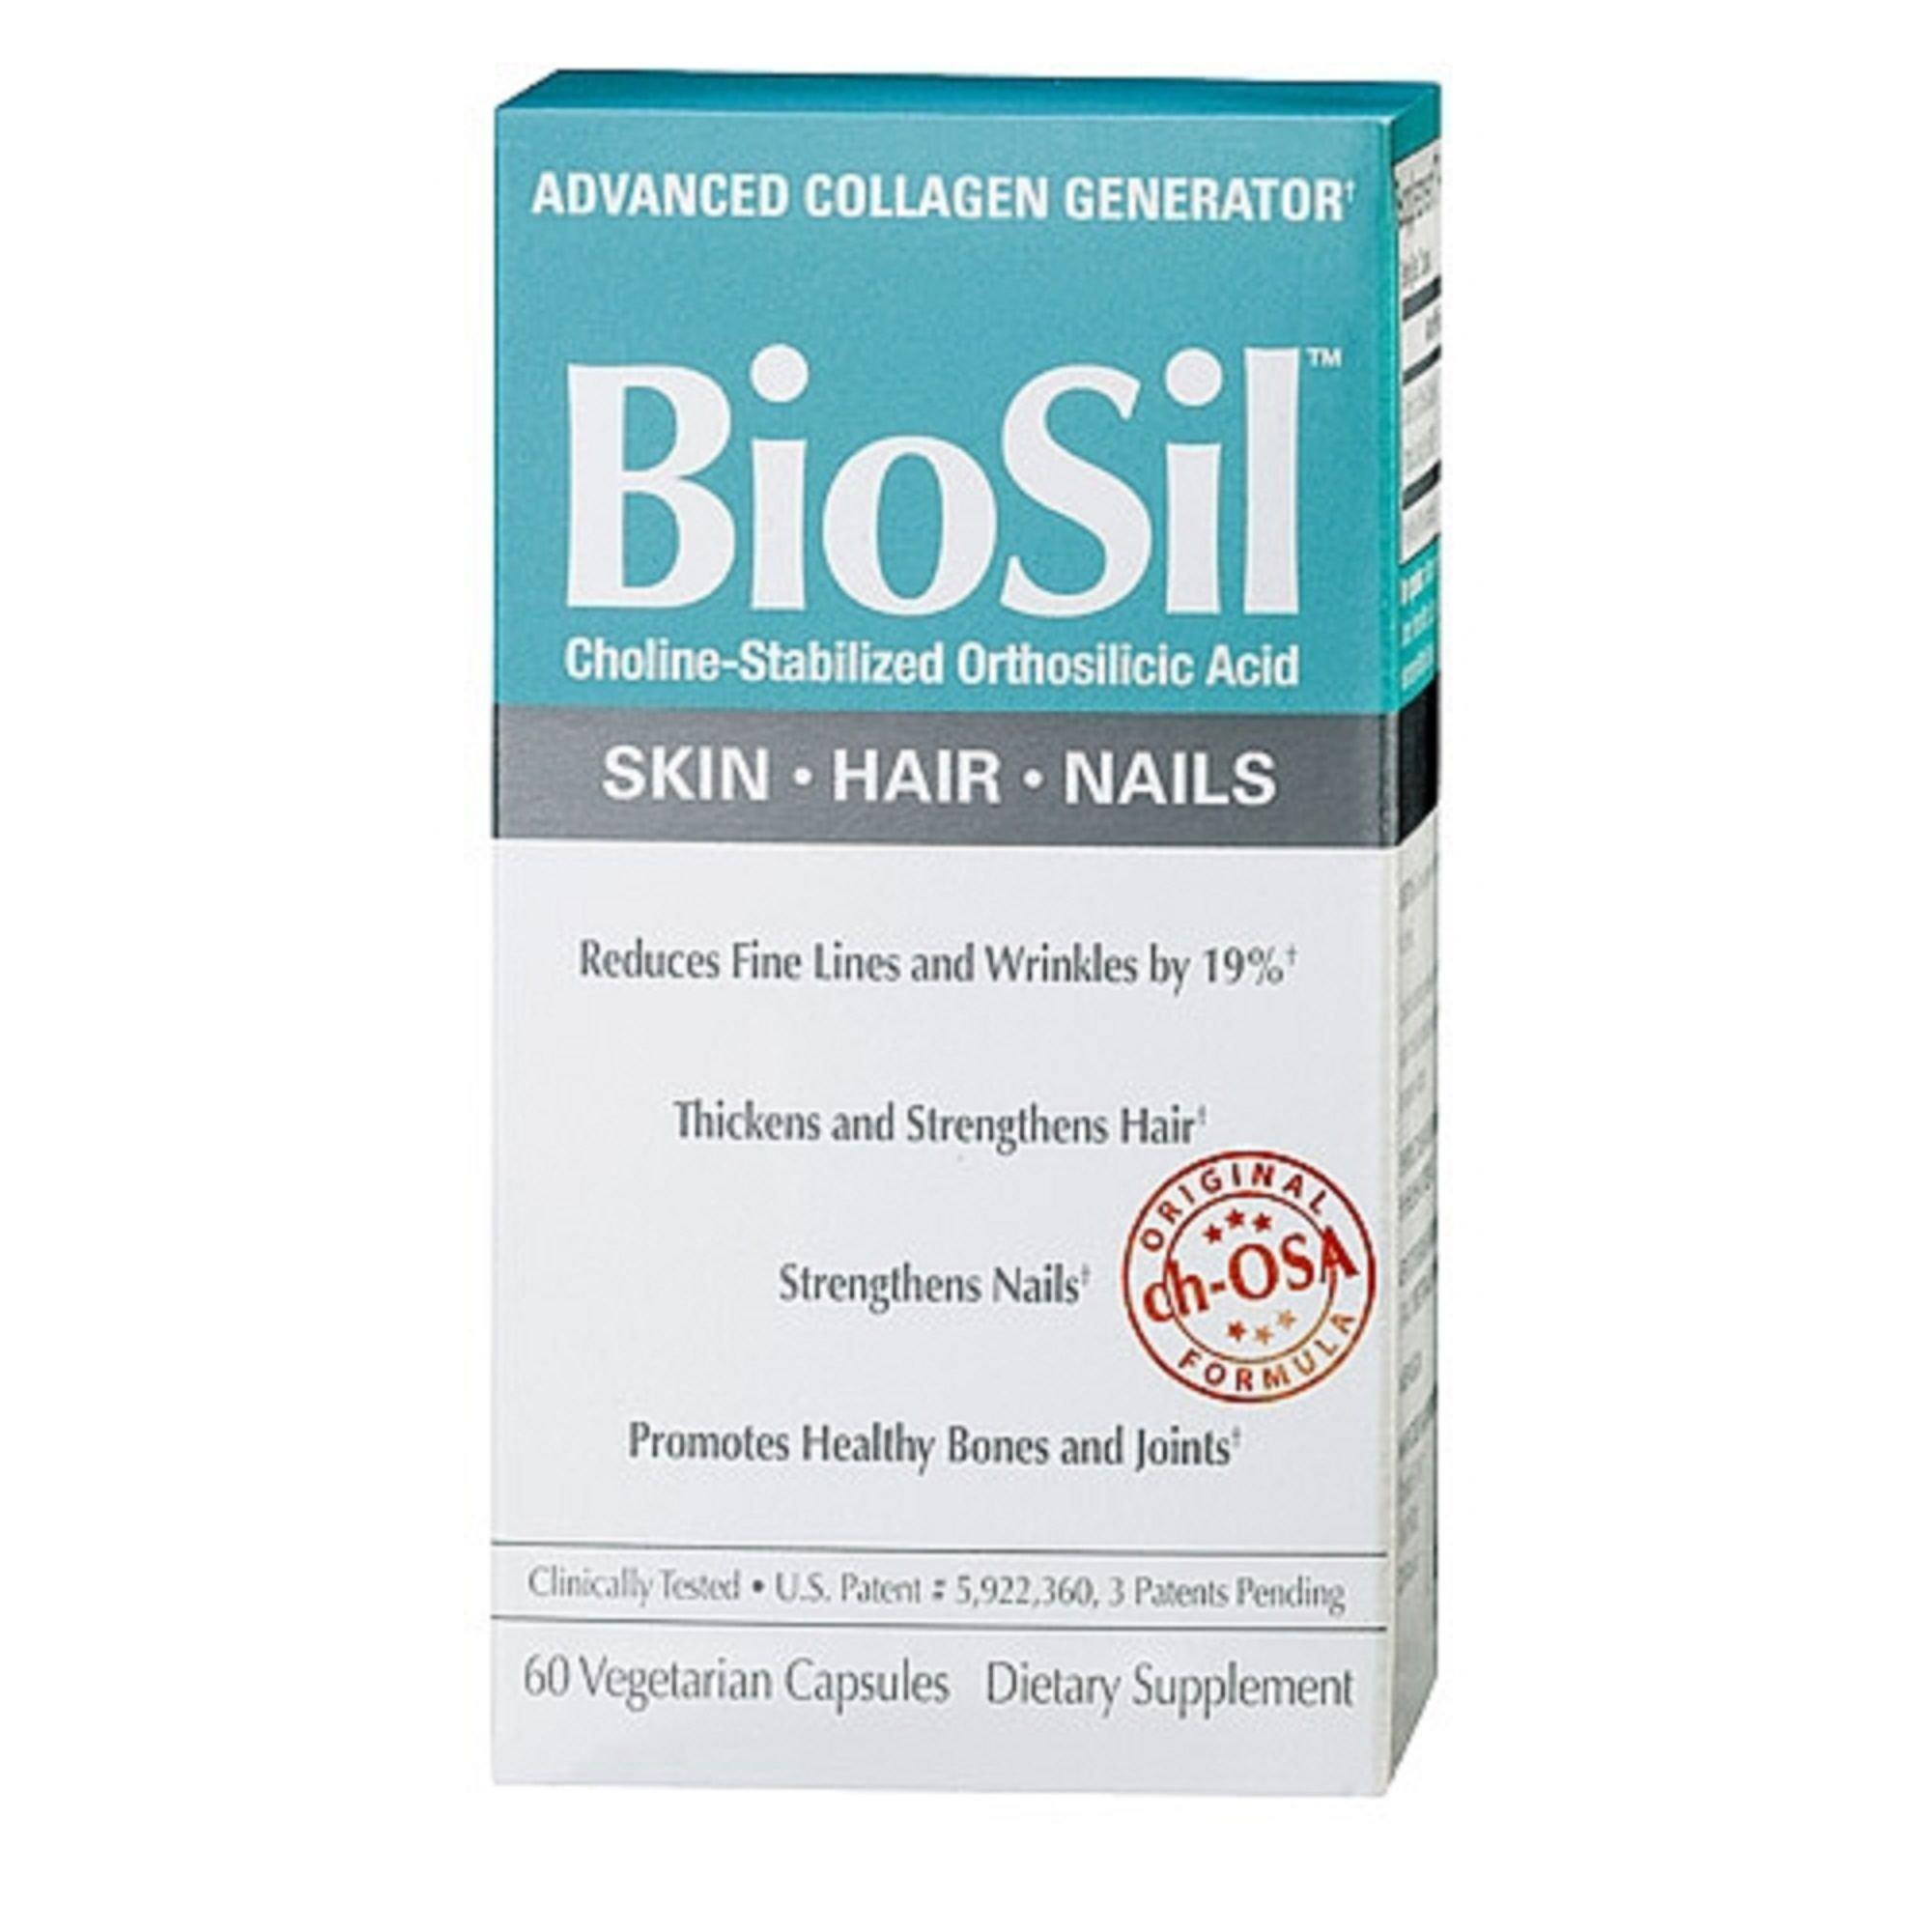 BioSil Advanced Collagen Generator, Reduces Fine Lines Wrinkles, Helps Hair, Nails Bones - 60 Vegetarian Caps